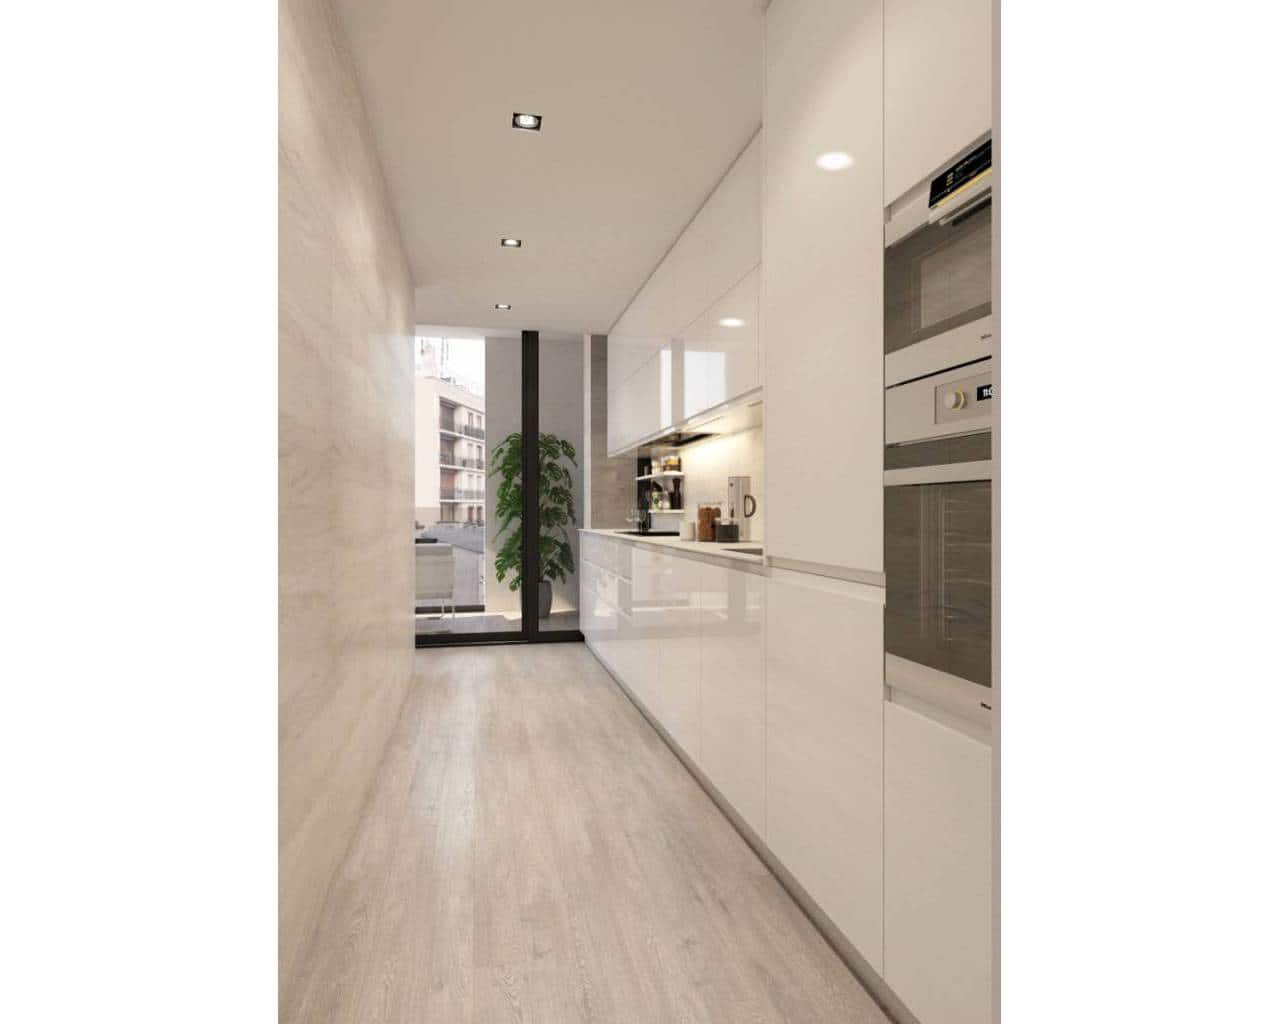 2 bedroom Apartment for sale in Guardamar del Segura with pool garage - € 190,000 (Ref: 4301013)